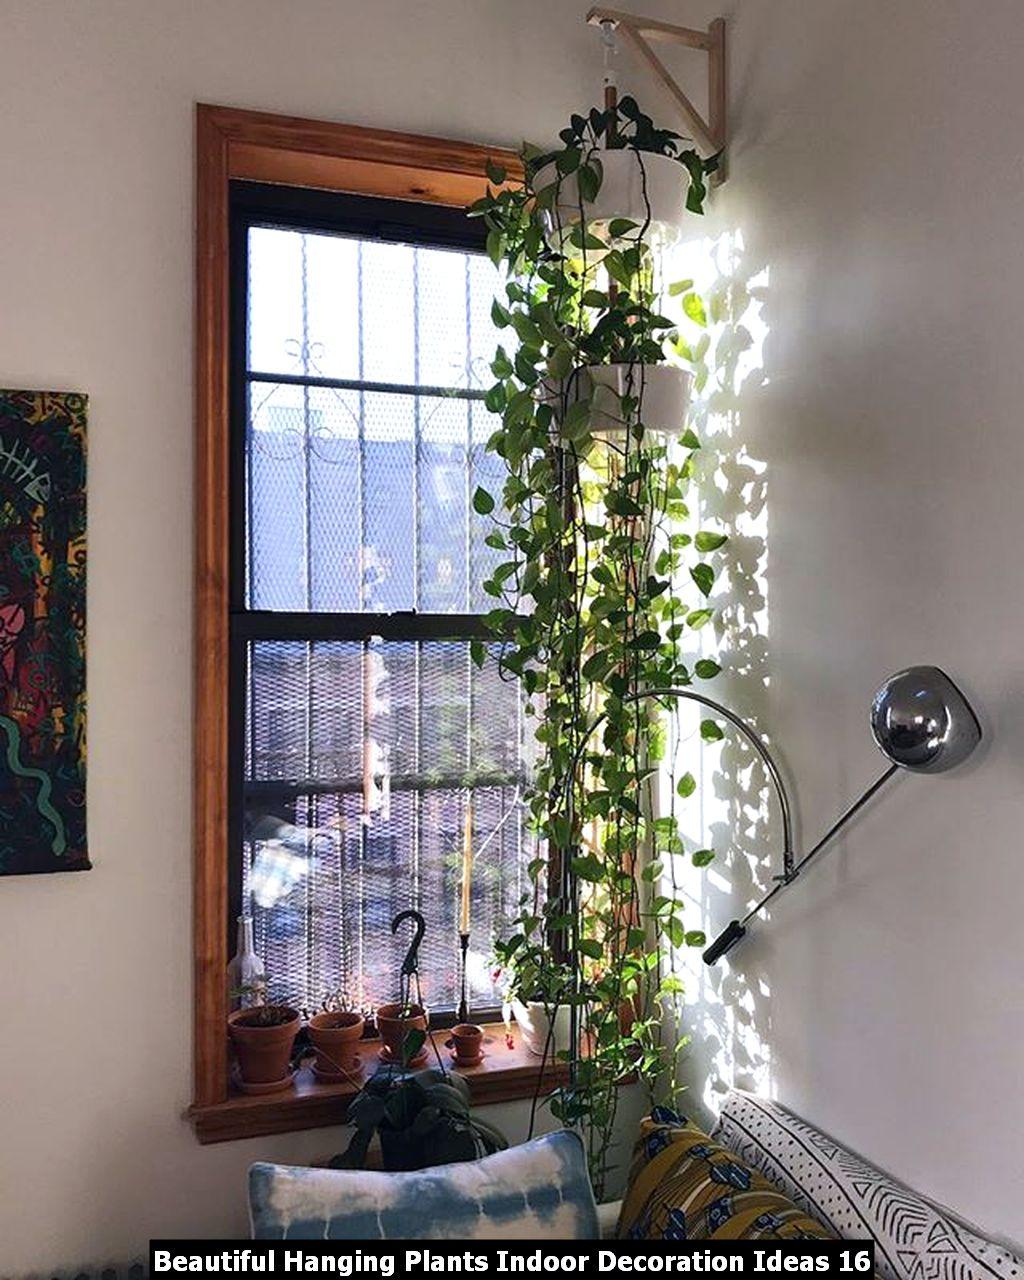 Beautiful Hanging Plants Indoor Decoration Ideas 16